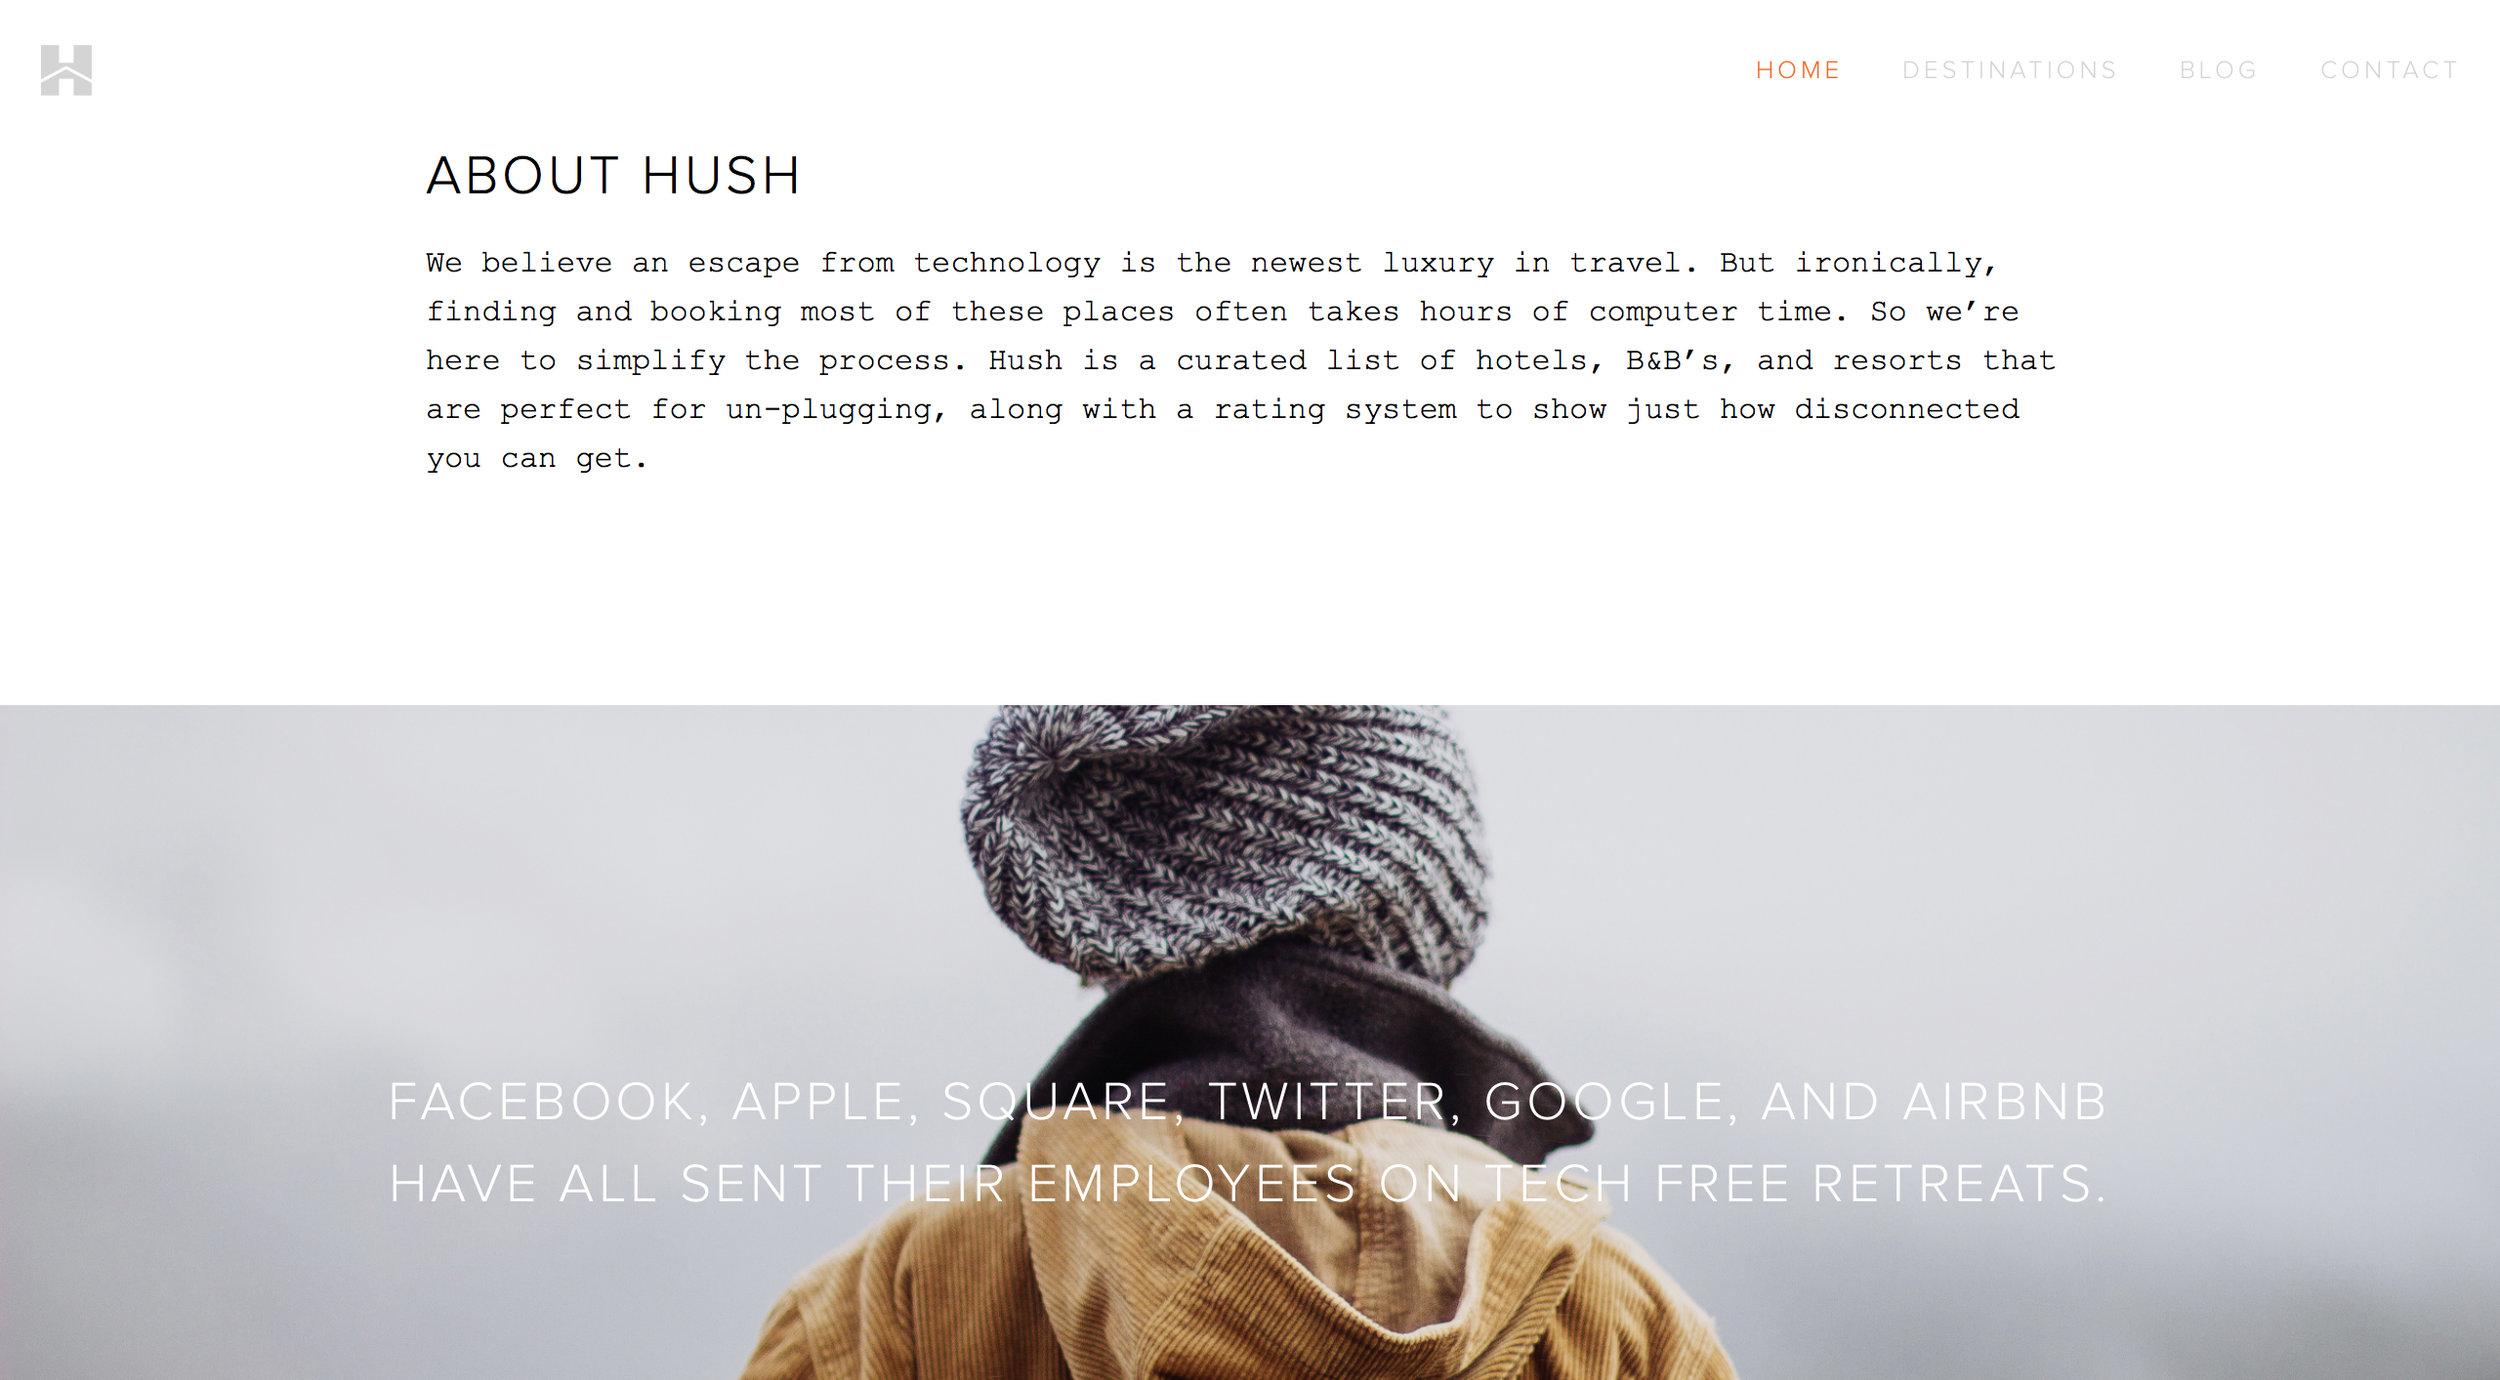 HUSH_0001_ABOUT.jpg